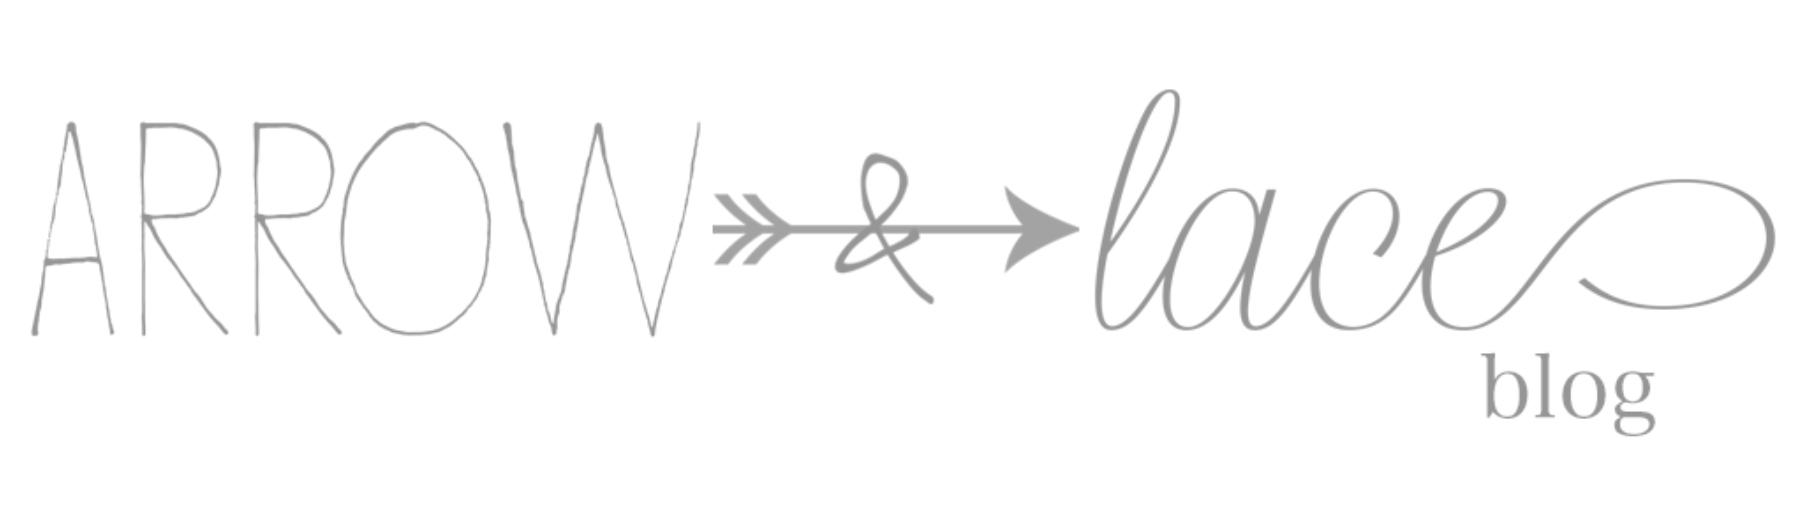 arrow and lace logo copy.jpg